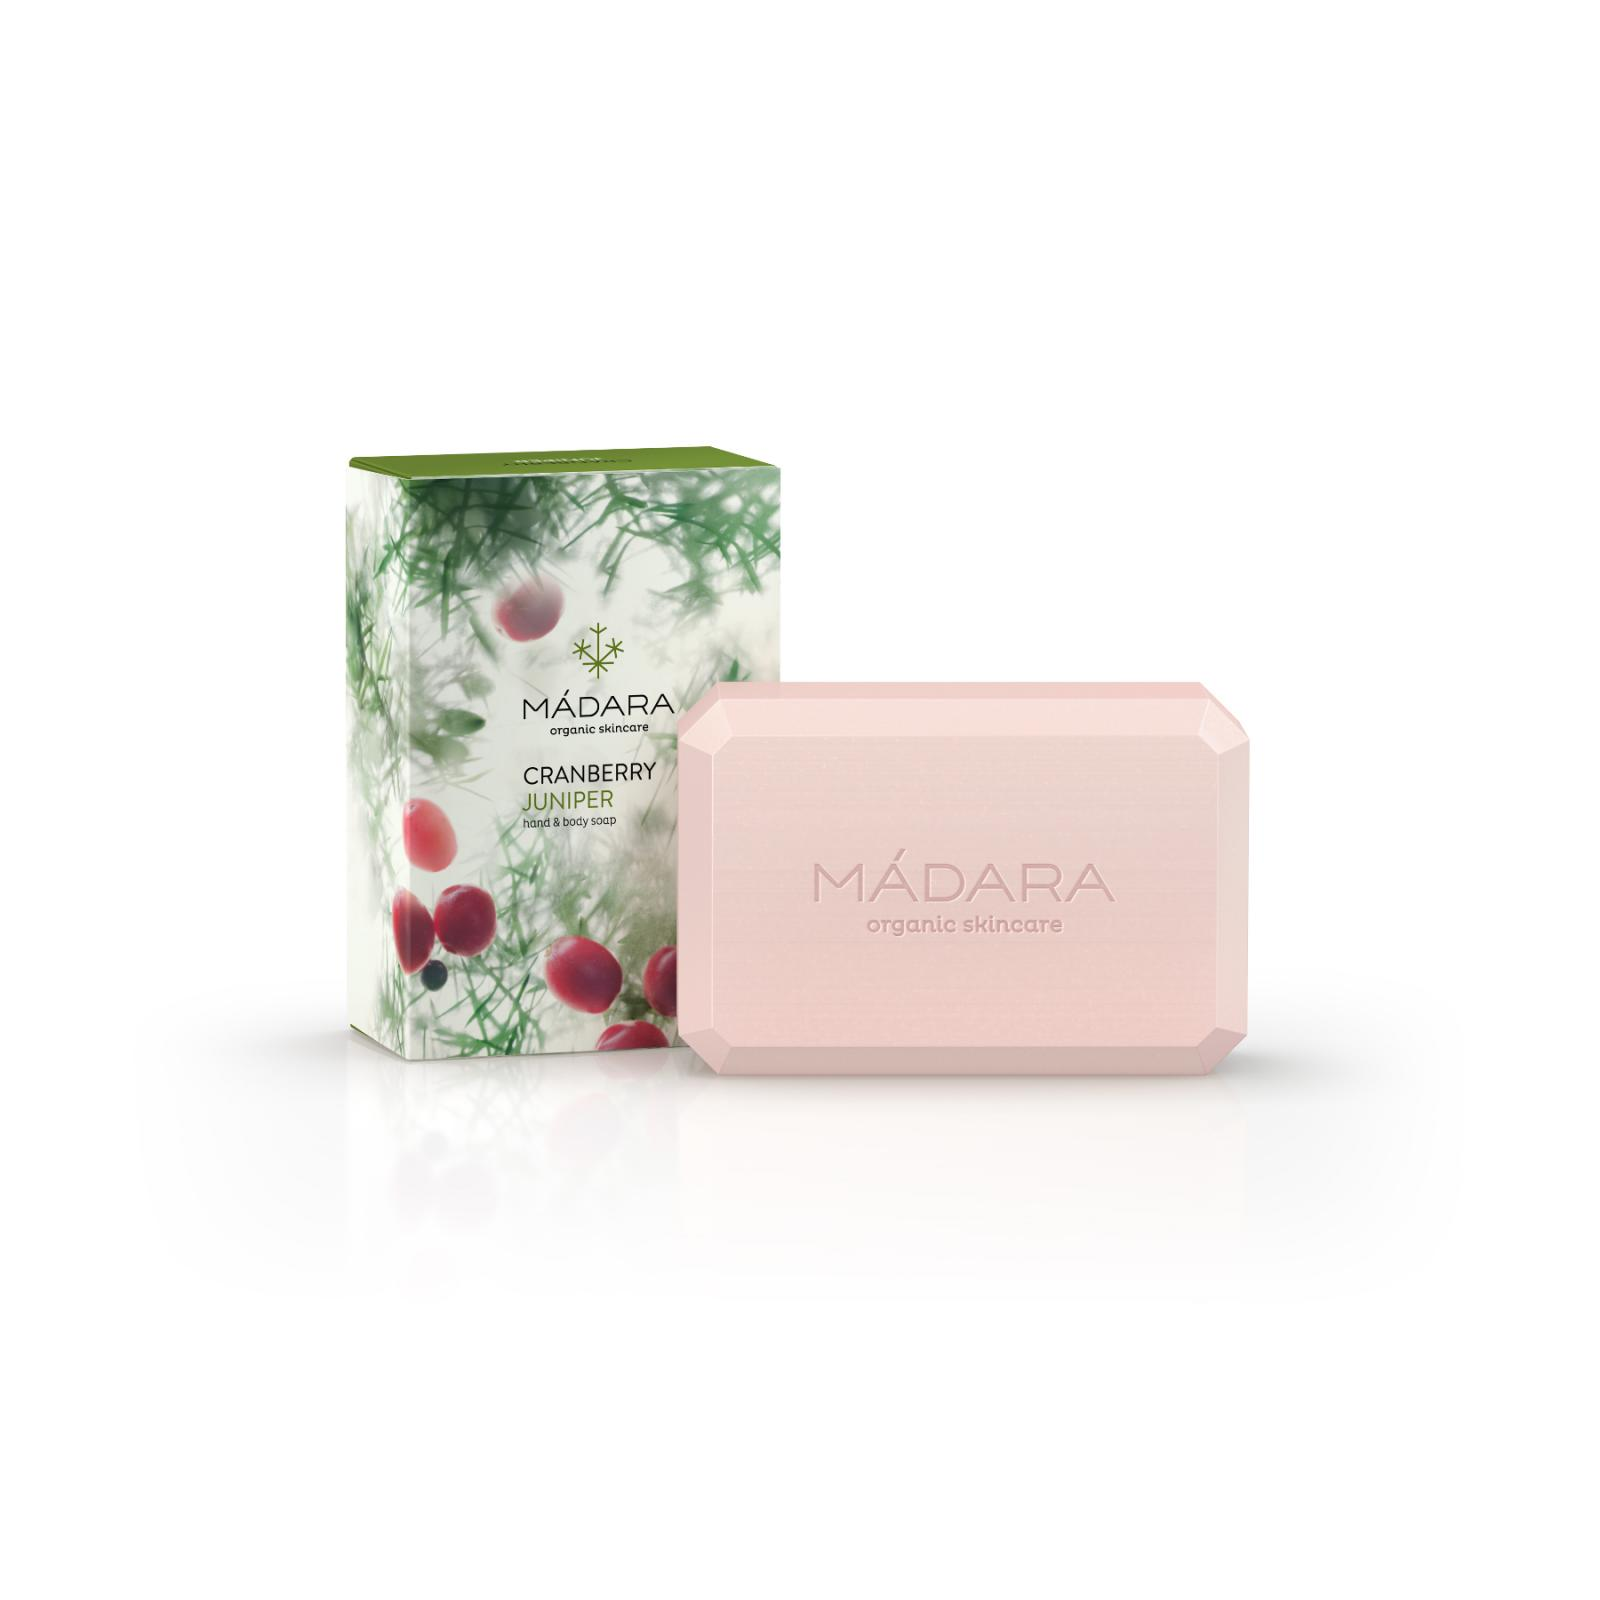 Mádara Tělové mýdlo Cranberry & Juniper 150 g